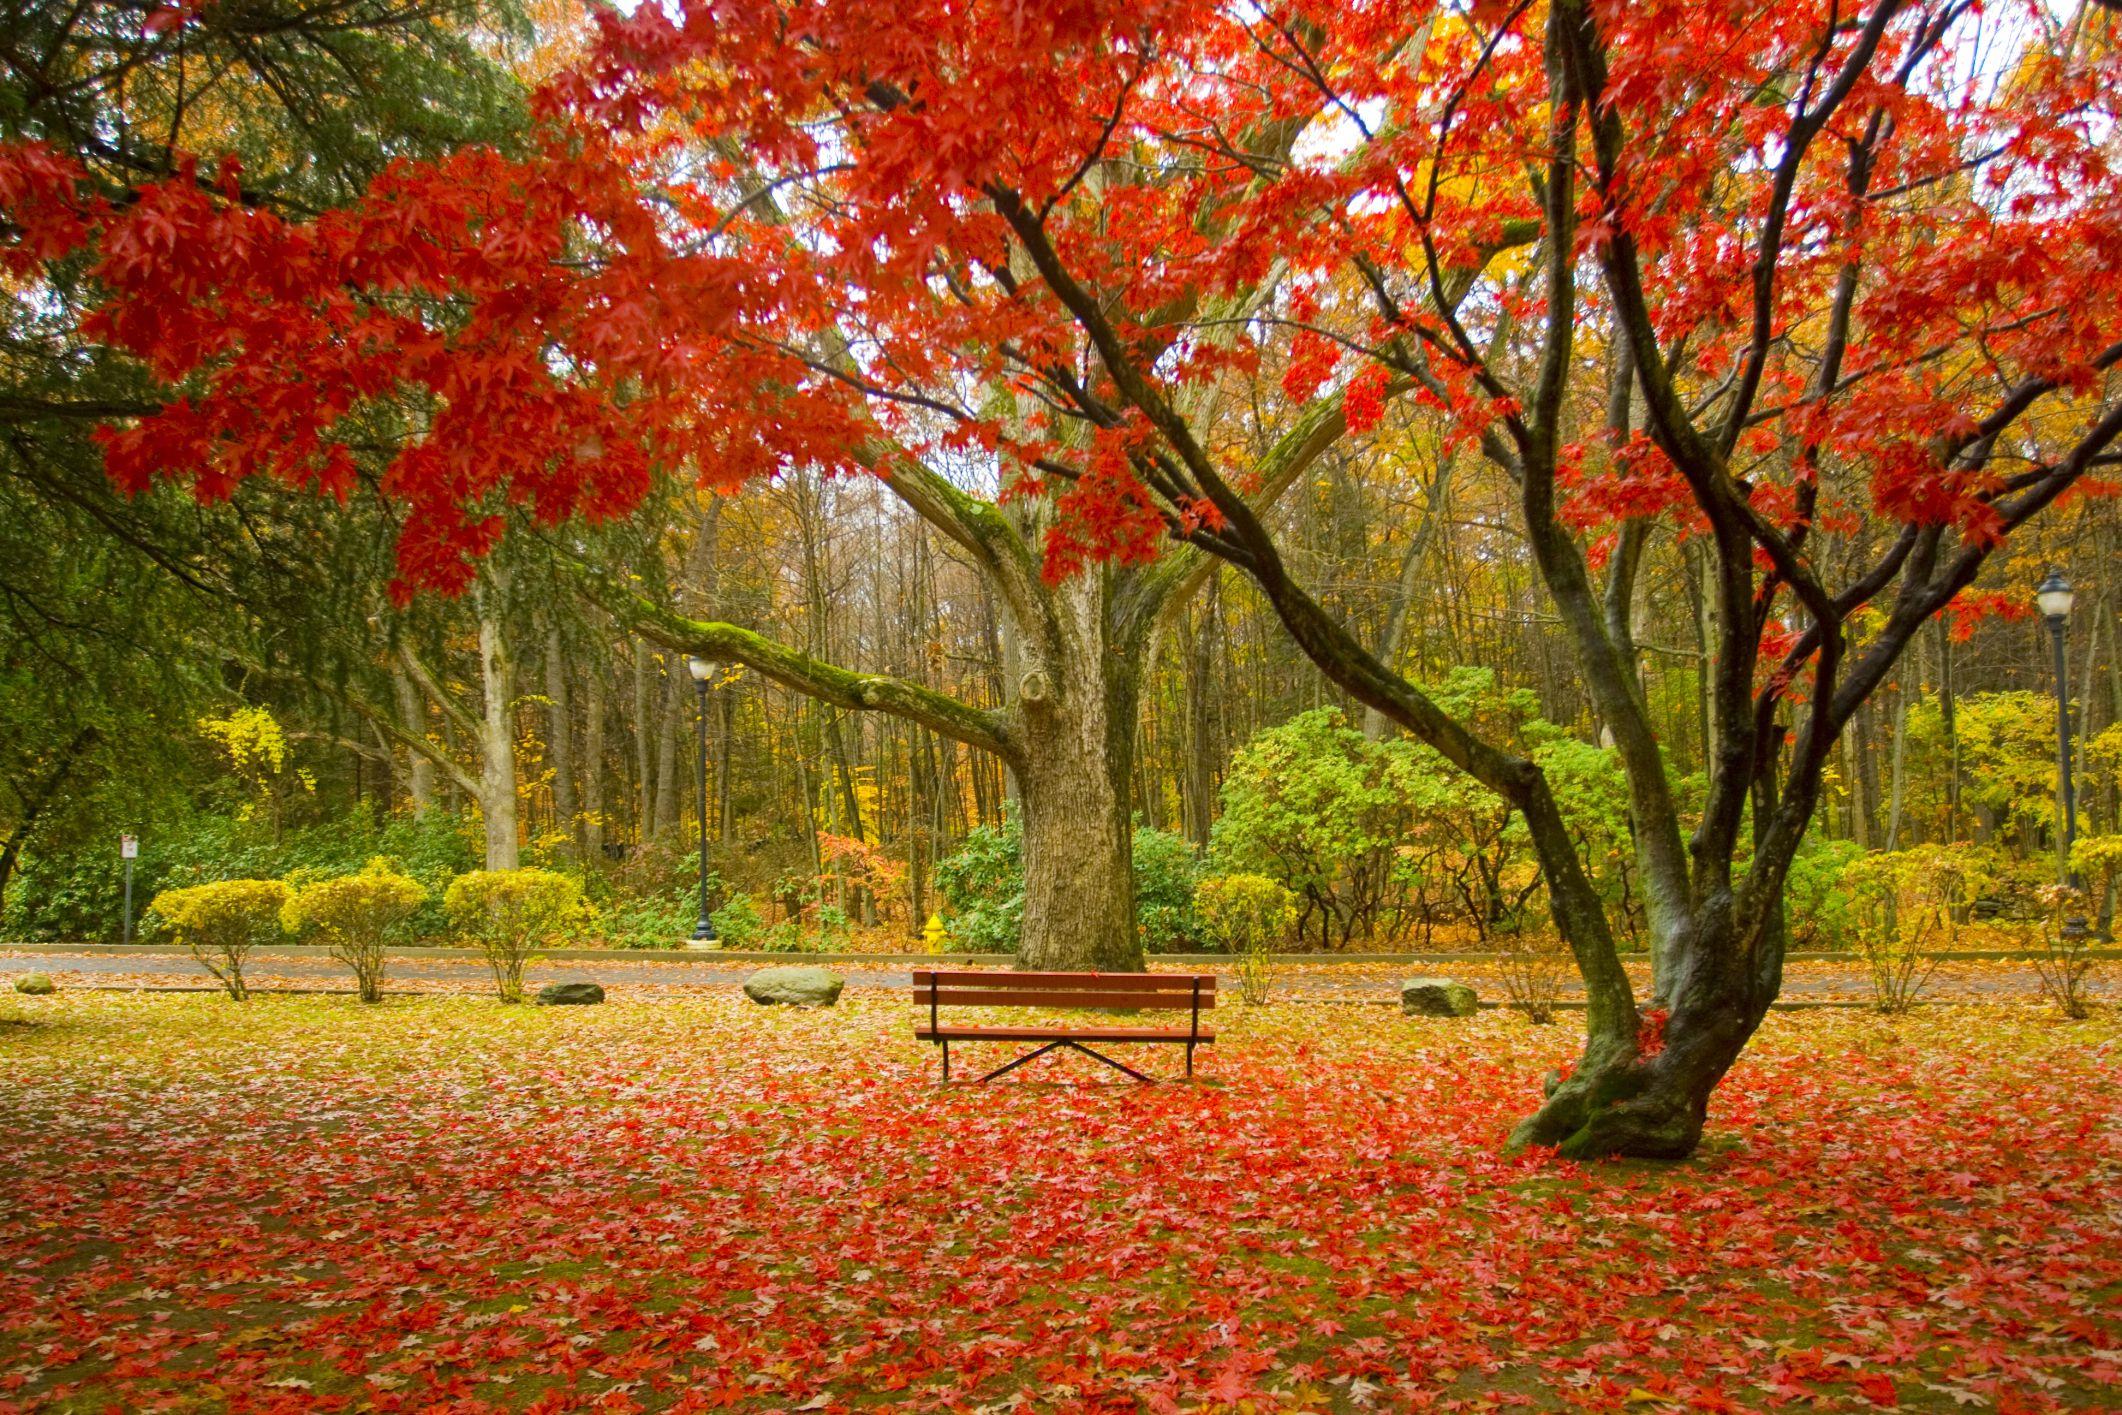 Fall Foliage 2019 New England New England Fall Foliage Central 2019 | A Travel Guide